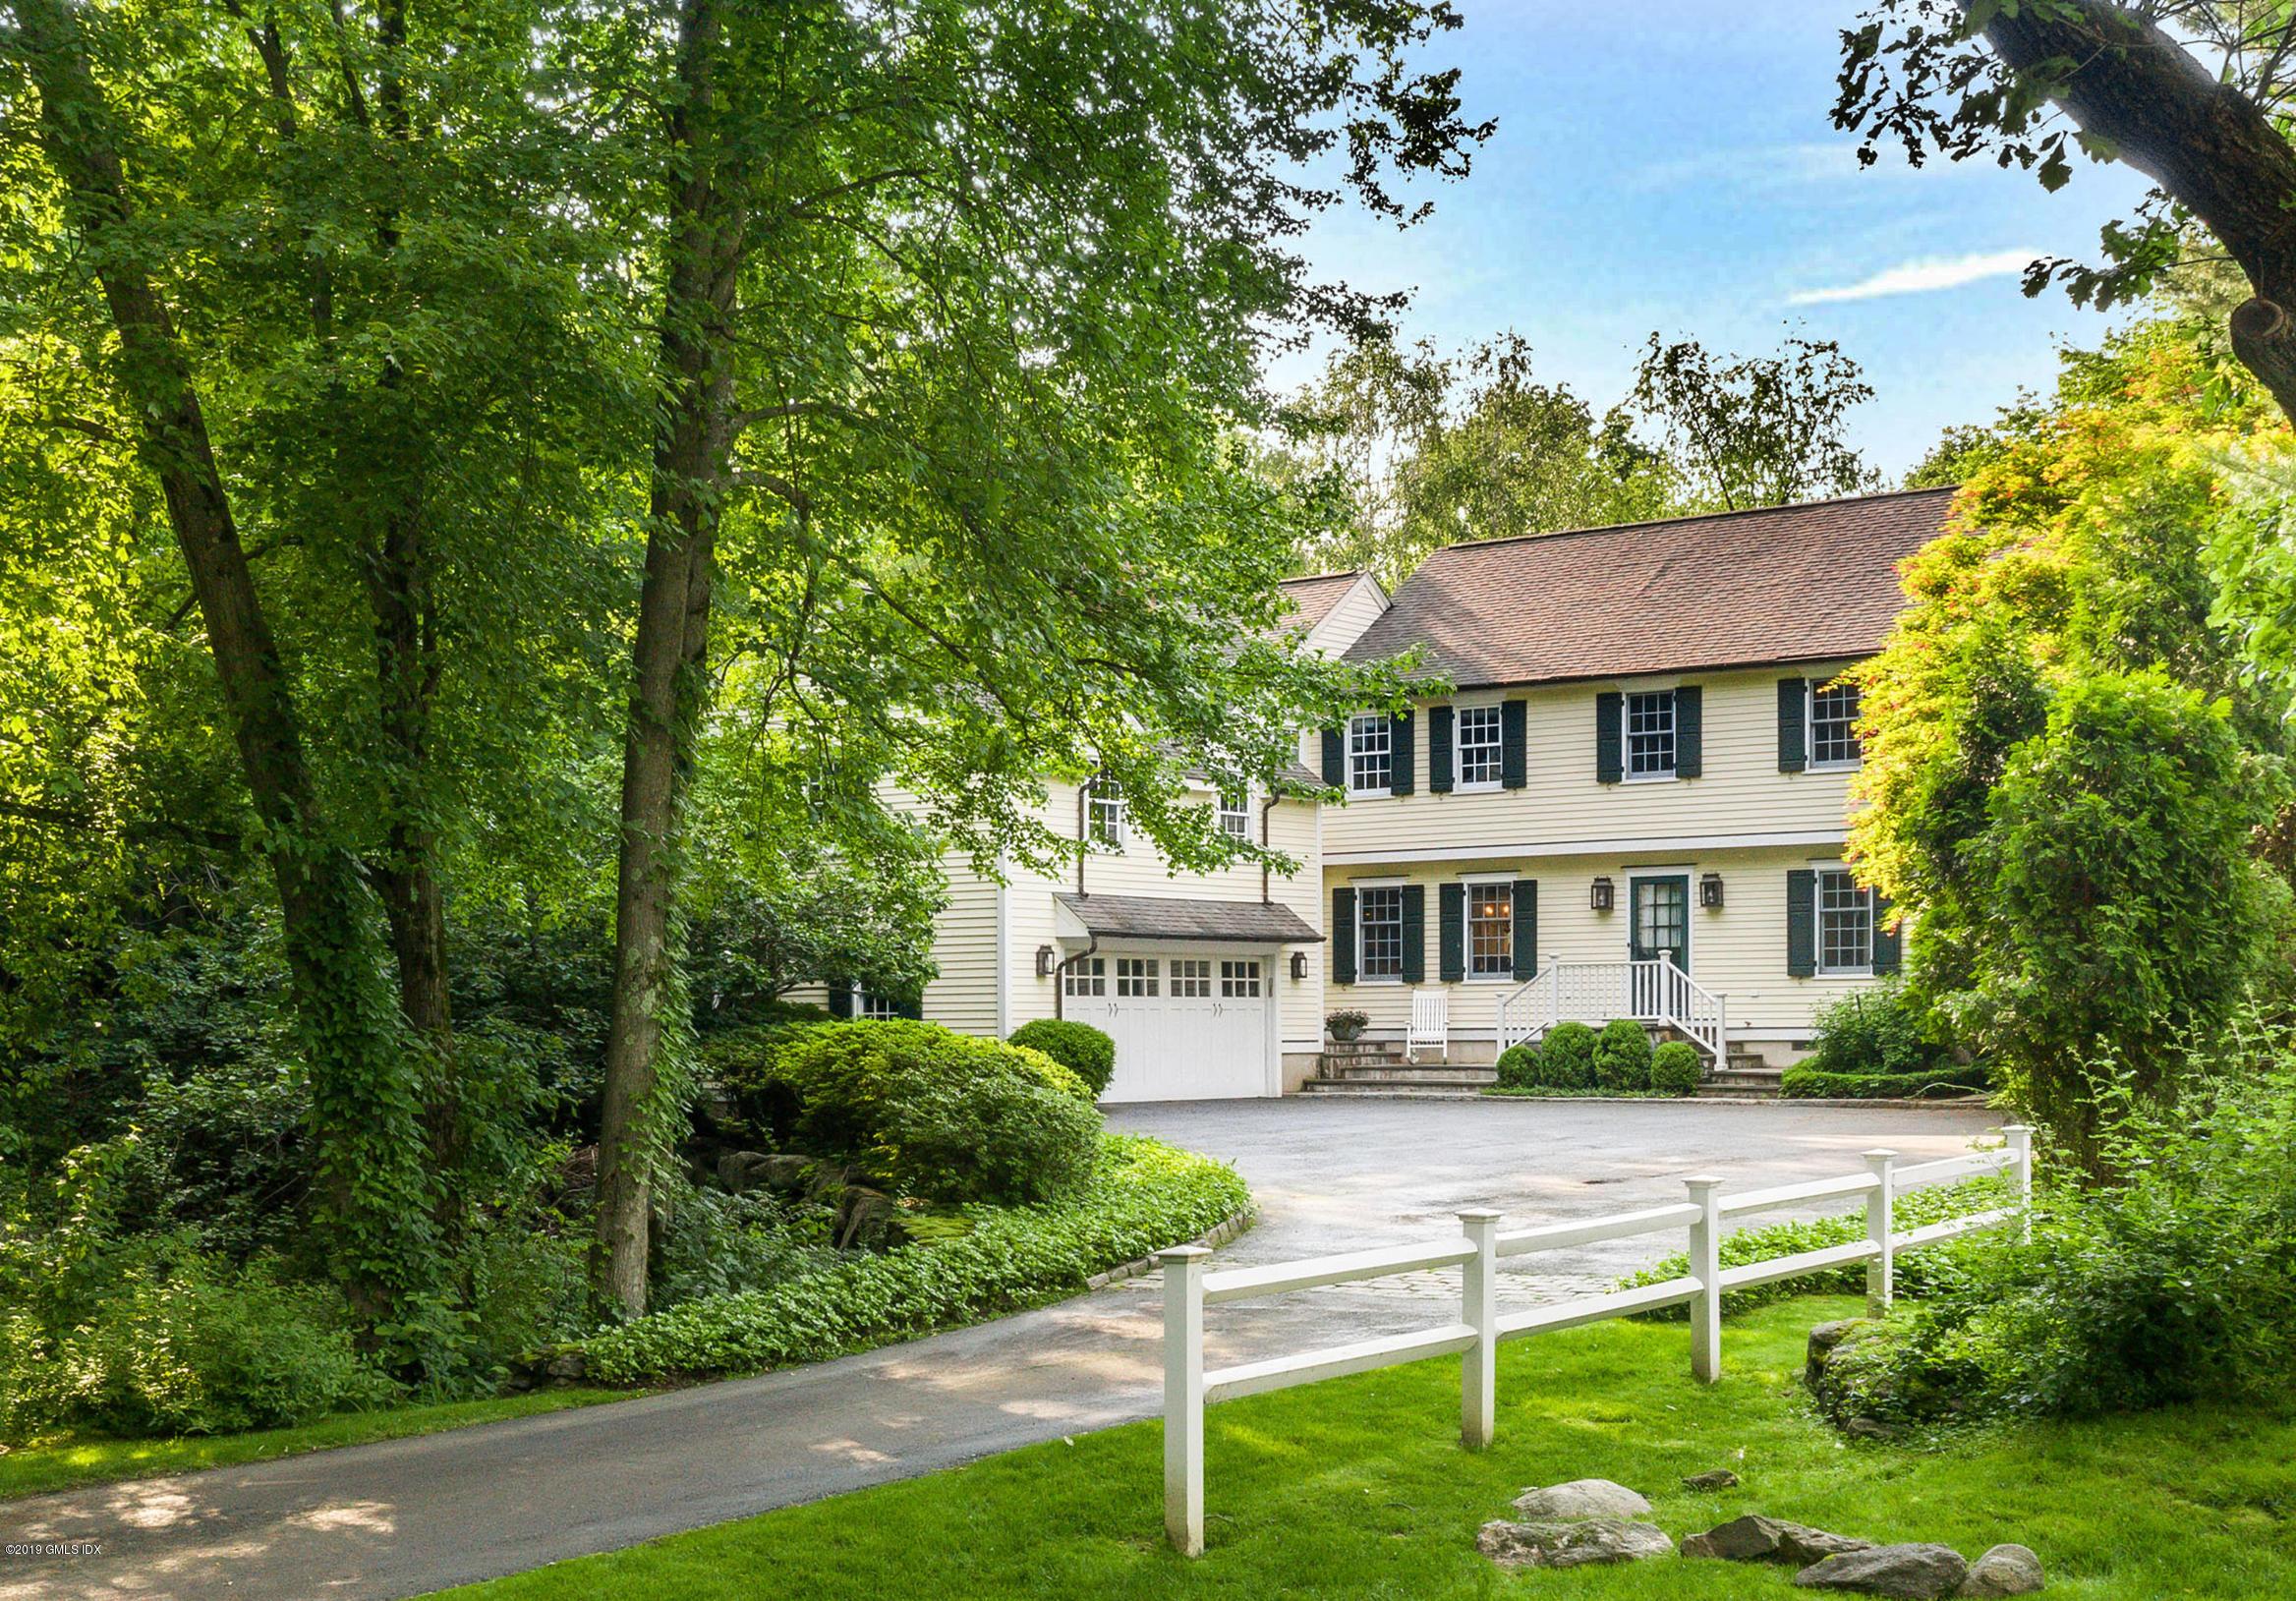 41 Angus Lane,Greenwich,Connecticut 06831,4 Bedrooms Bedrooms,3 BathroomsBathrooms,Single family,Angus,107859